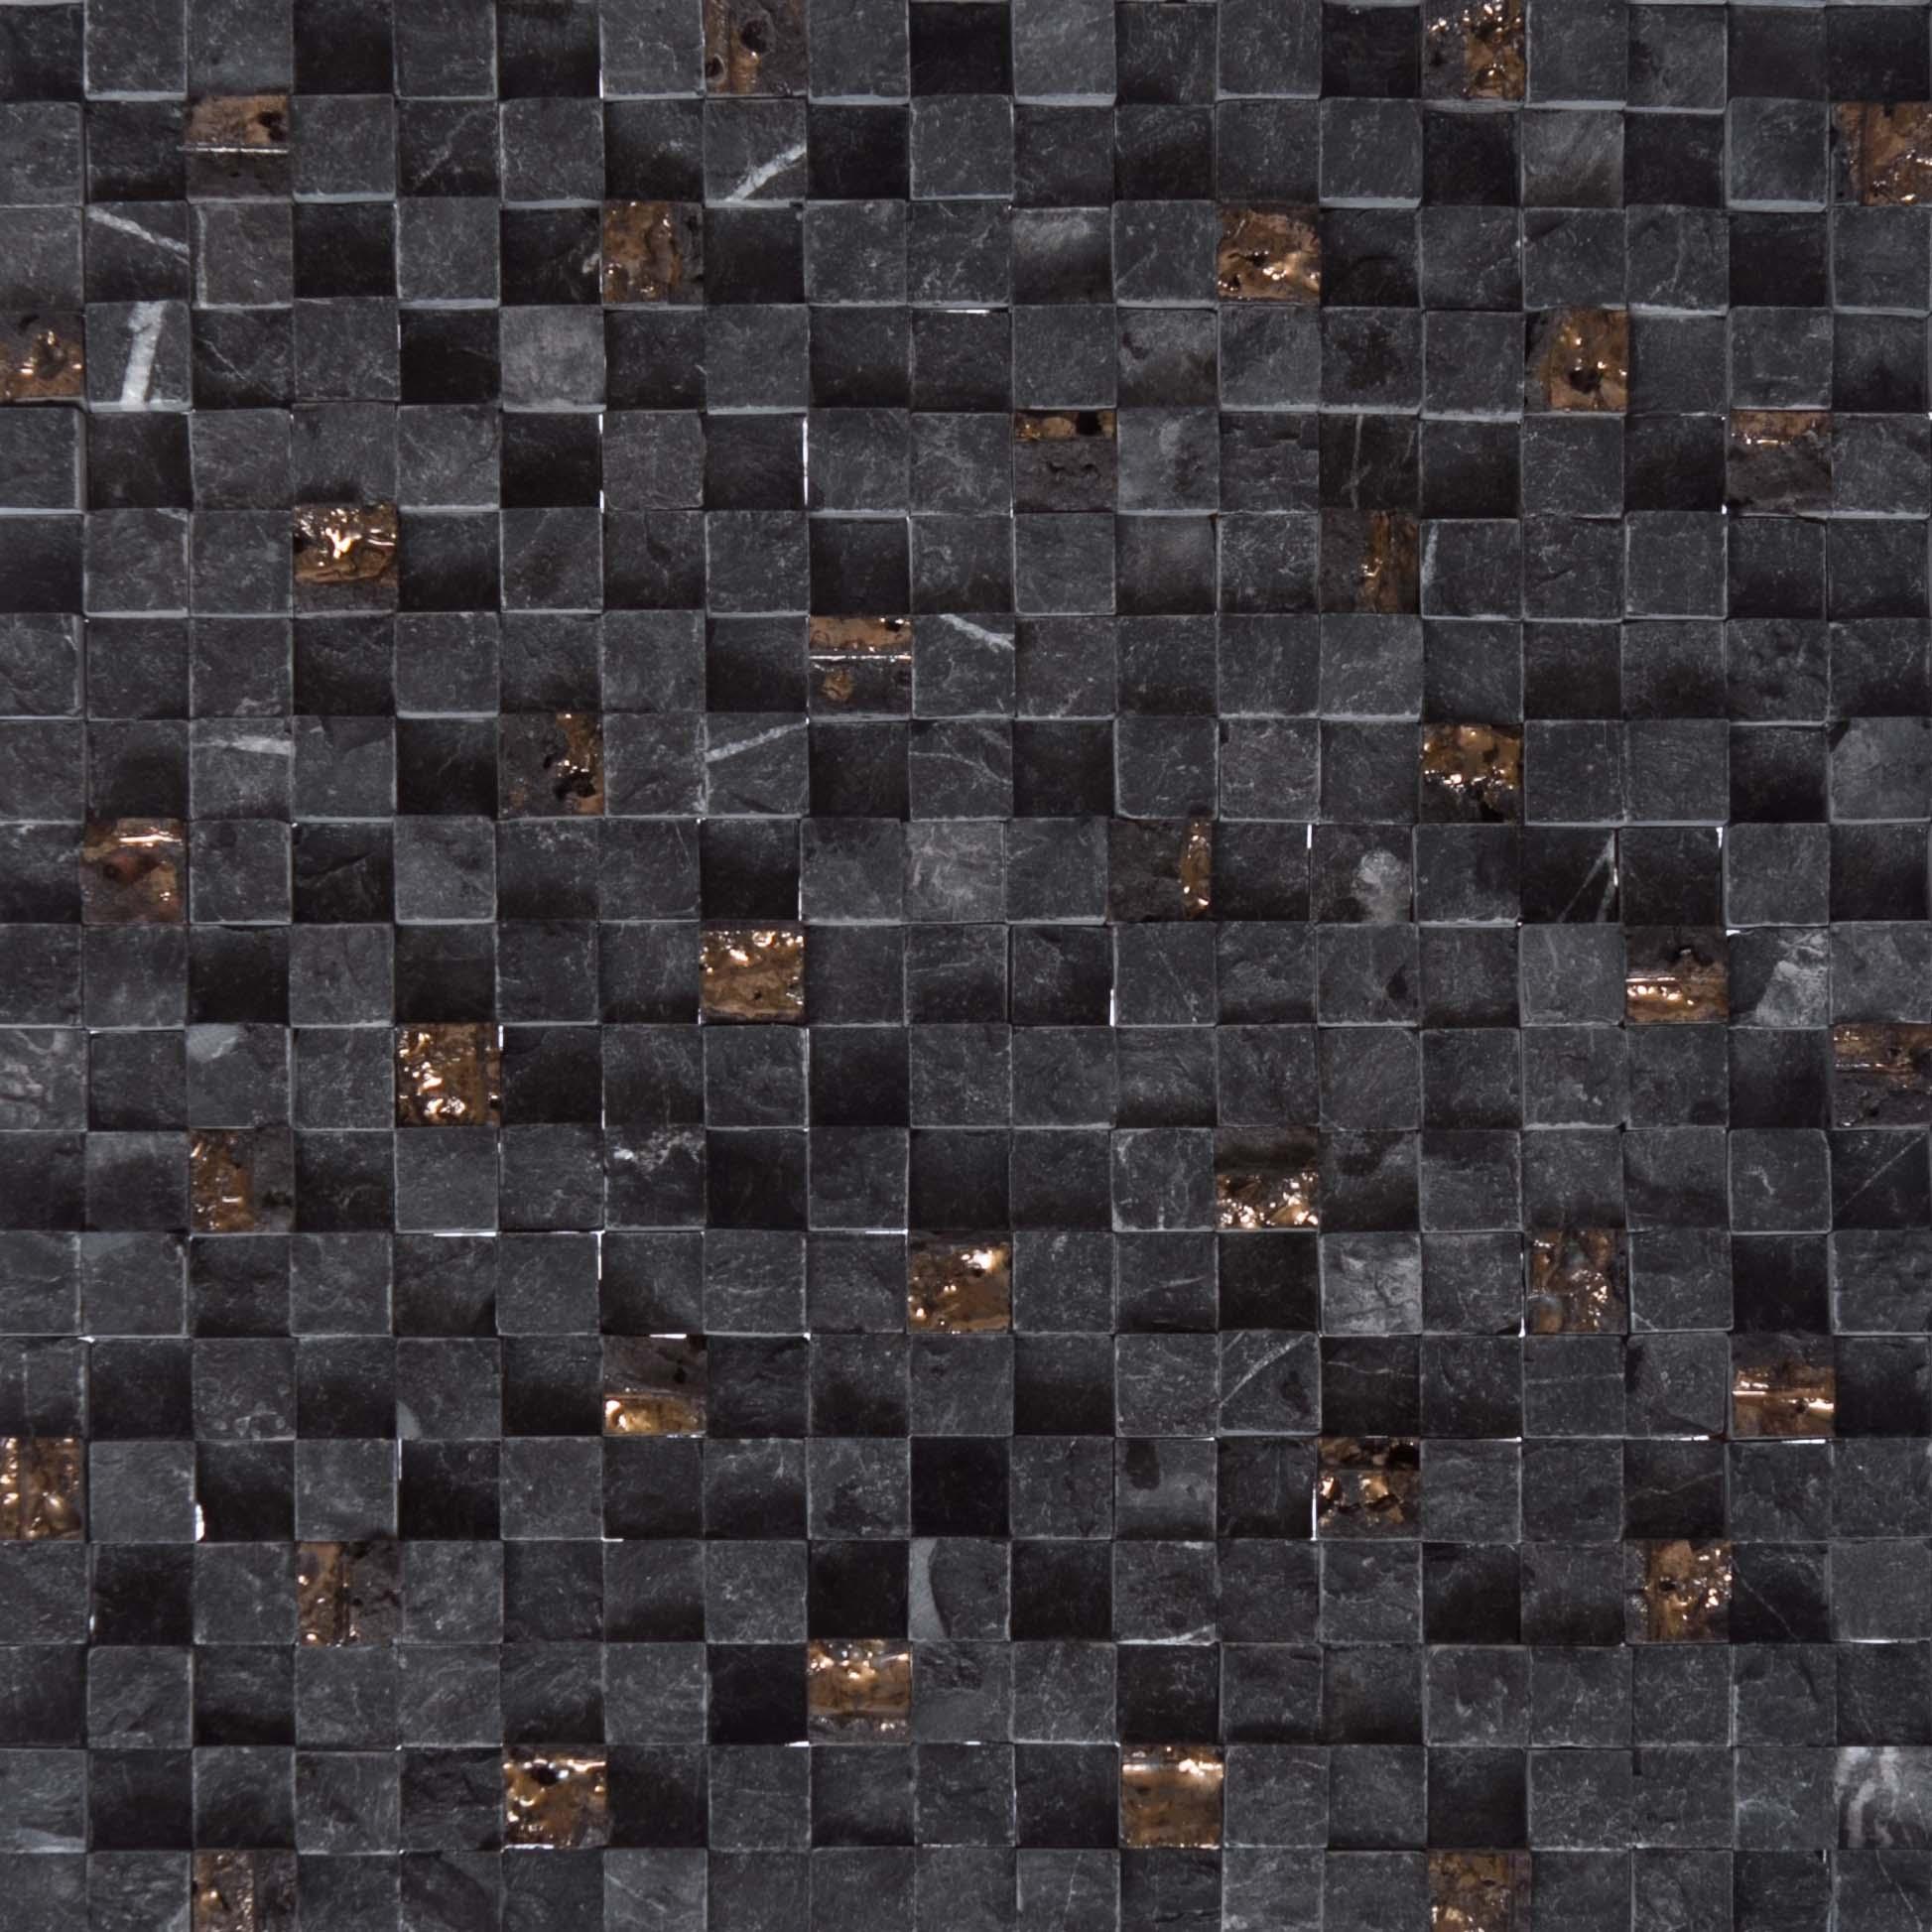 altura nero mozzaico leading tile